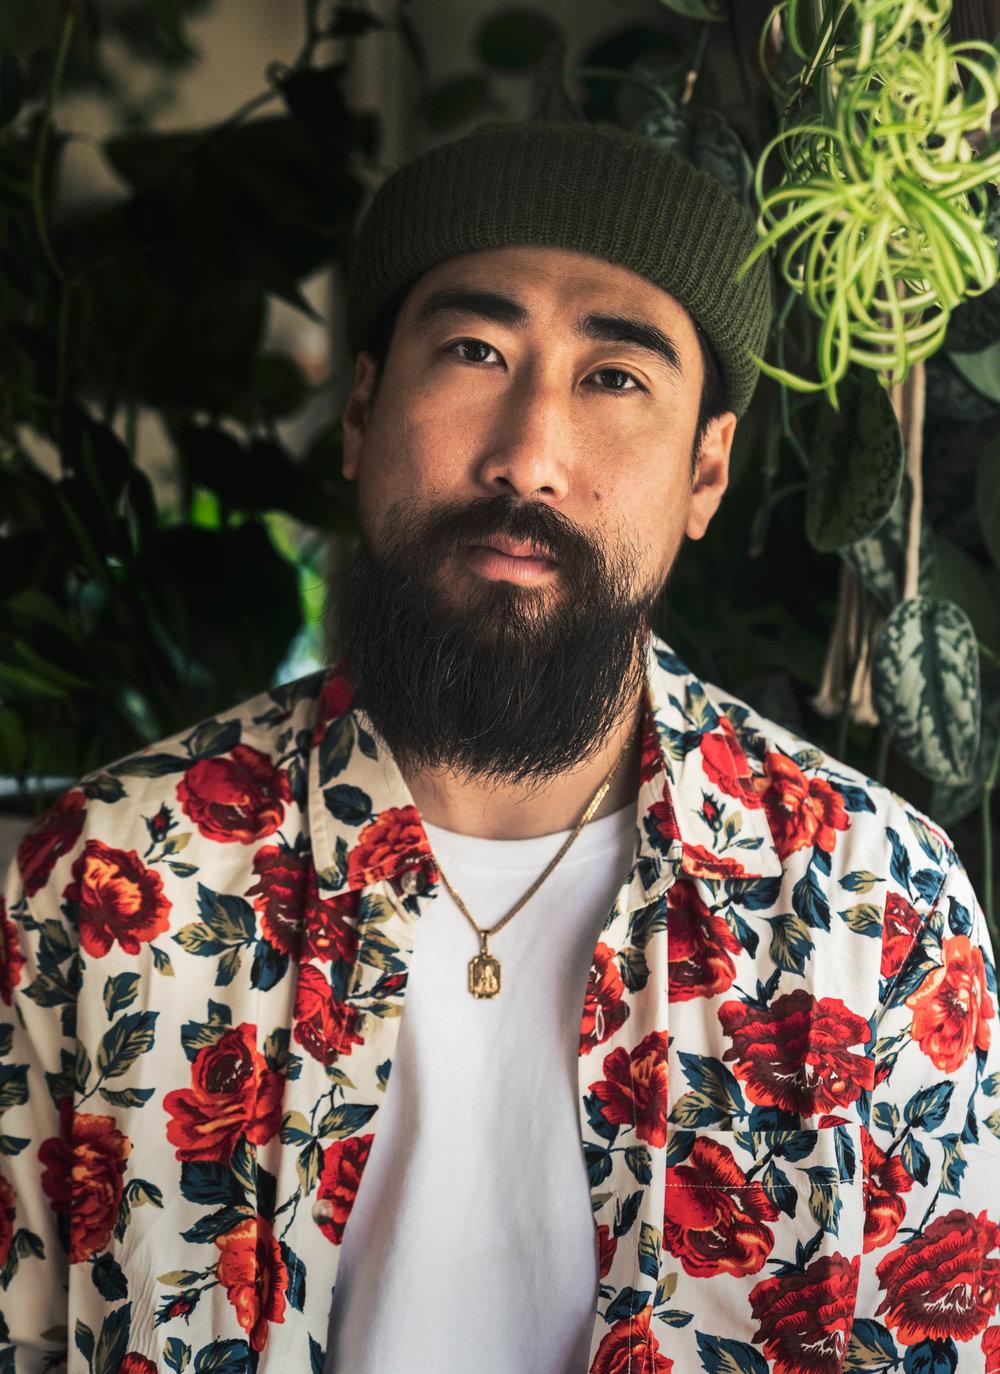 ryan feng justfeng just feng sexy cool hip asian men beard